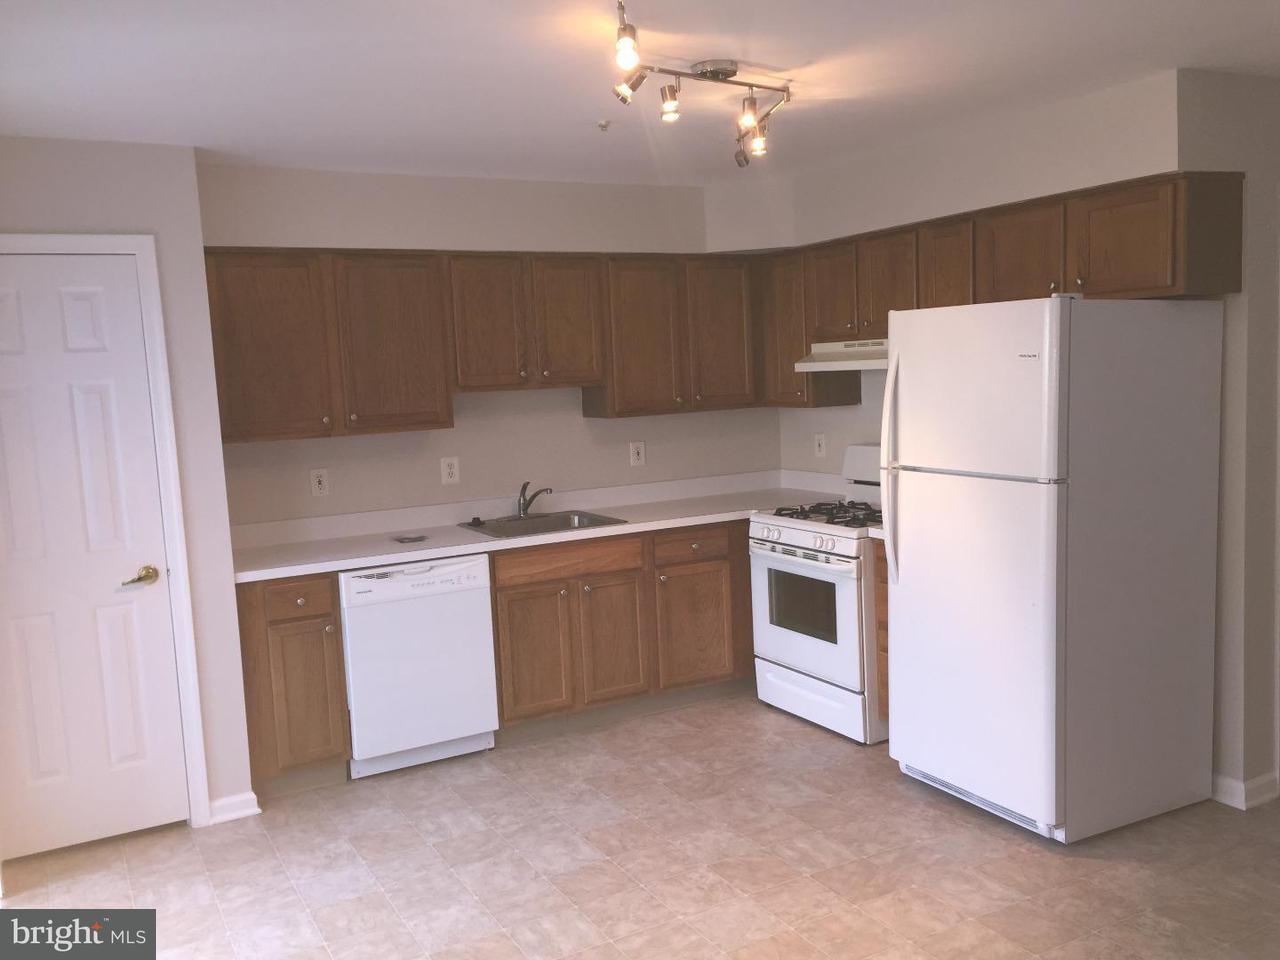 联栋屋 为 出租 在 145 BUCKINGHAM WAY Mount Laurel, 新泽西州 08054 美国